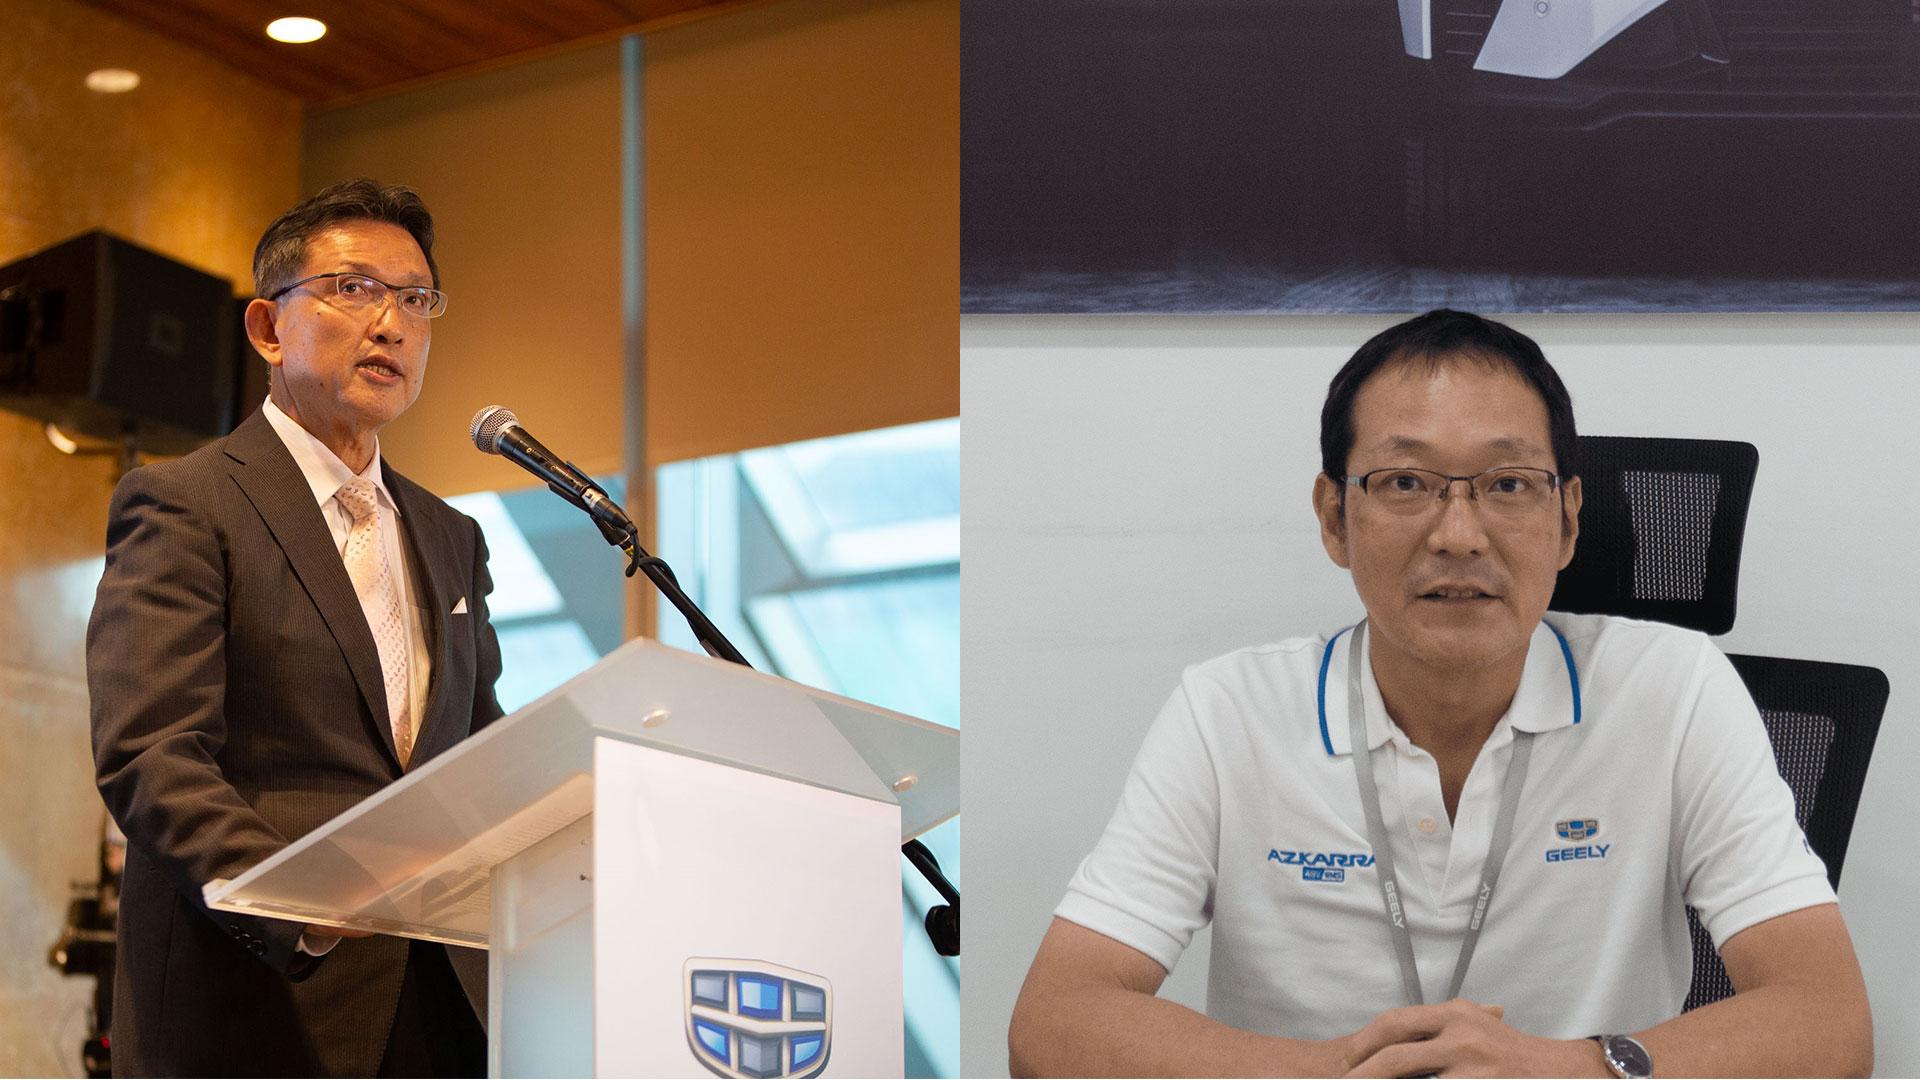 Left: Mikihisa Takayama; right: Yosuke Nishi